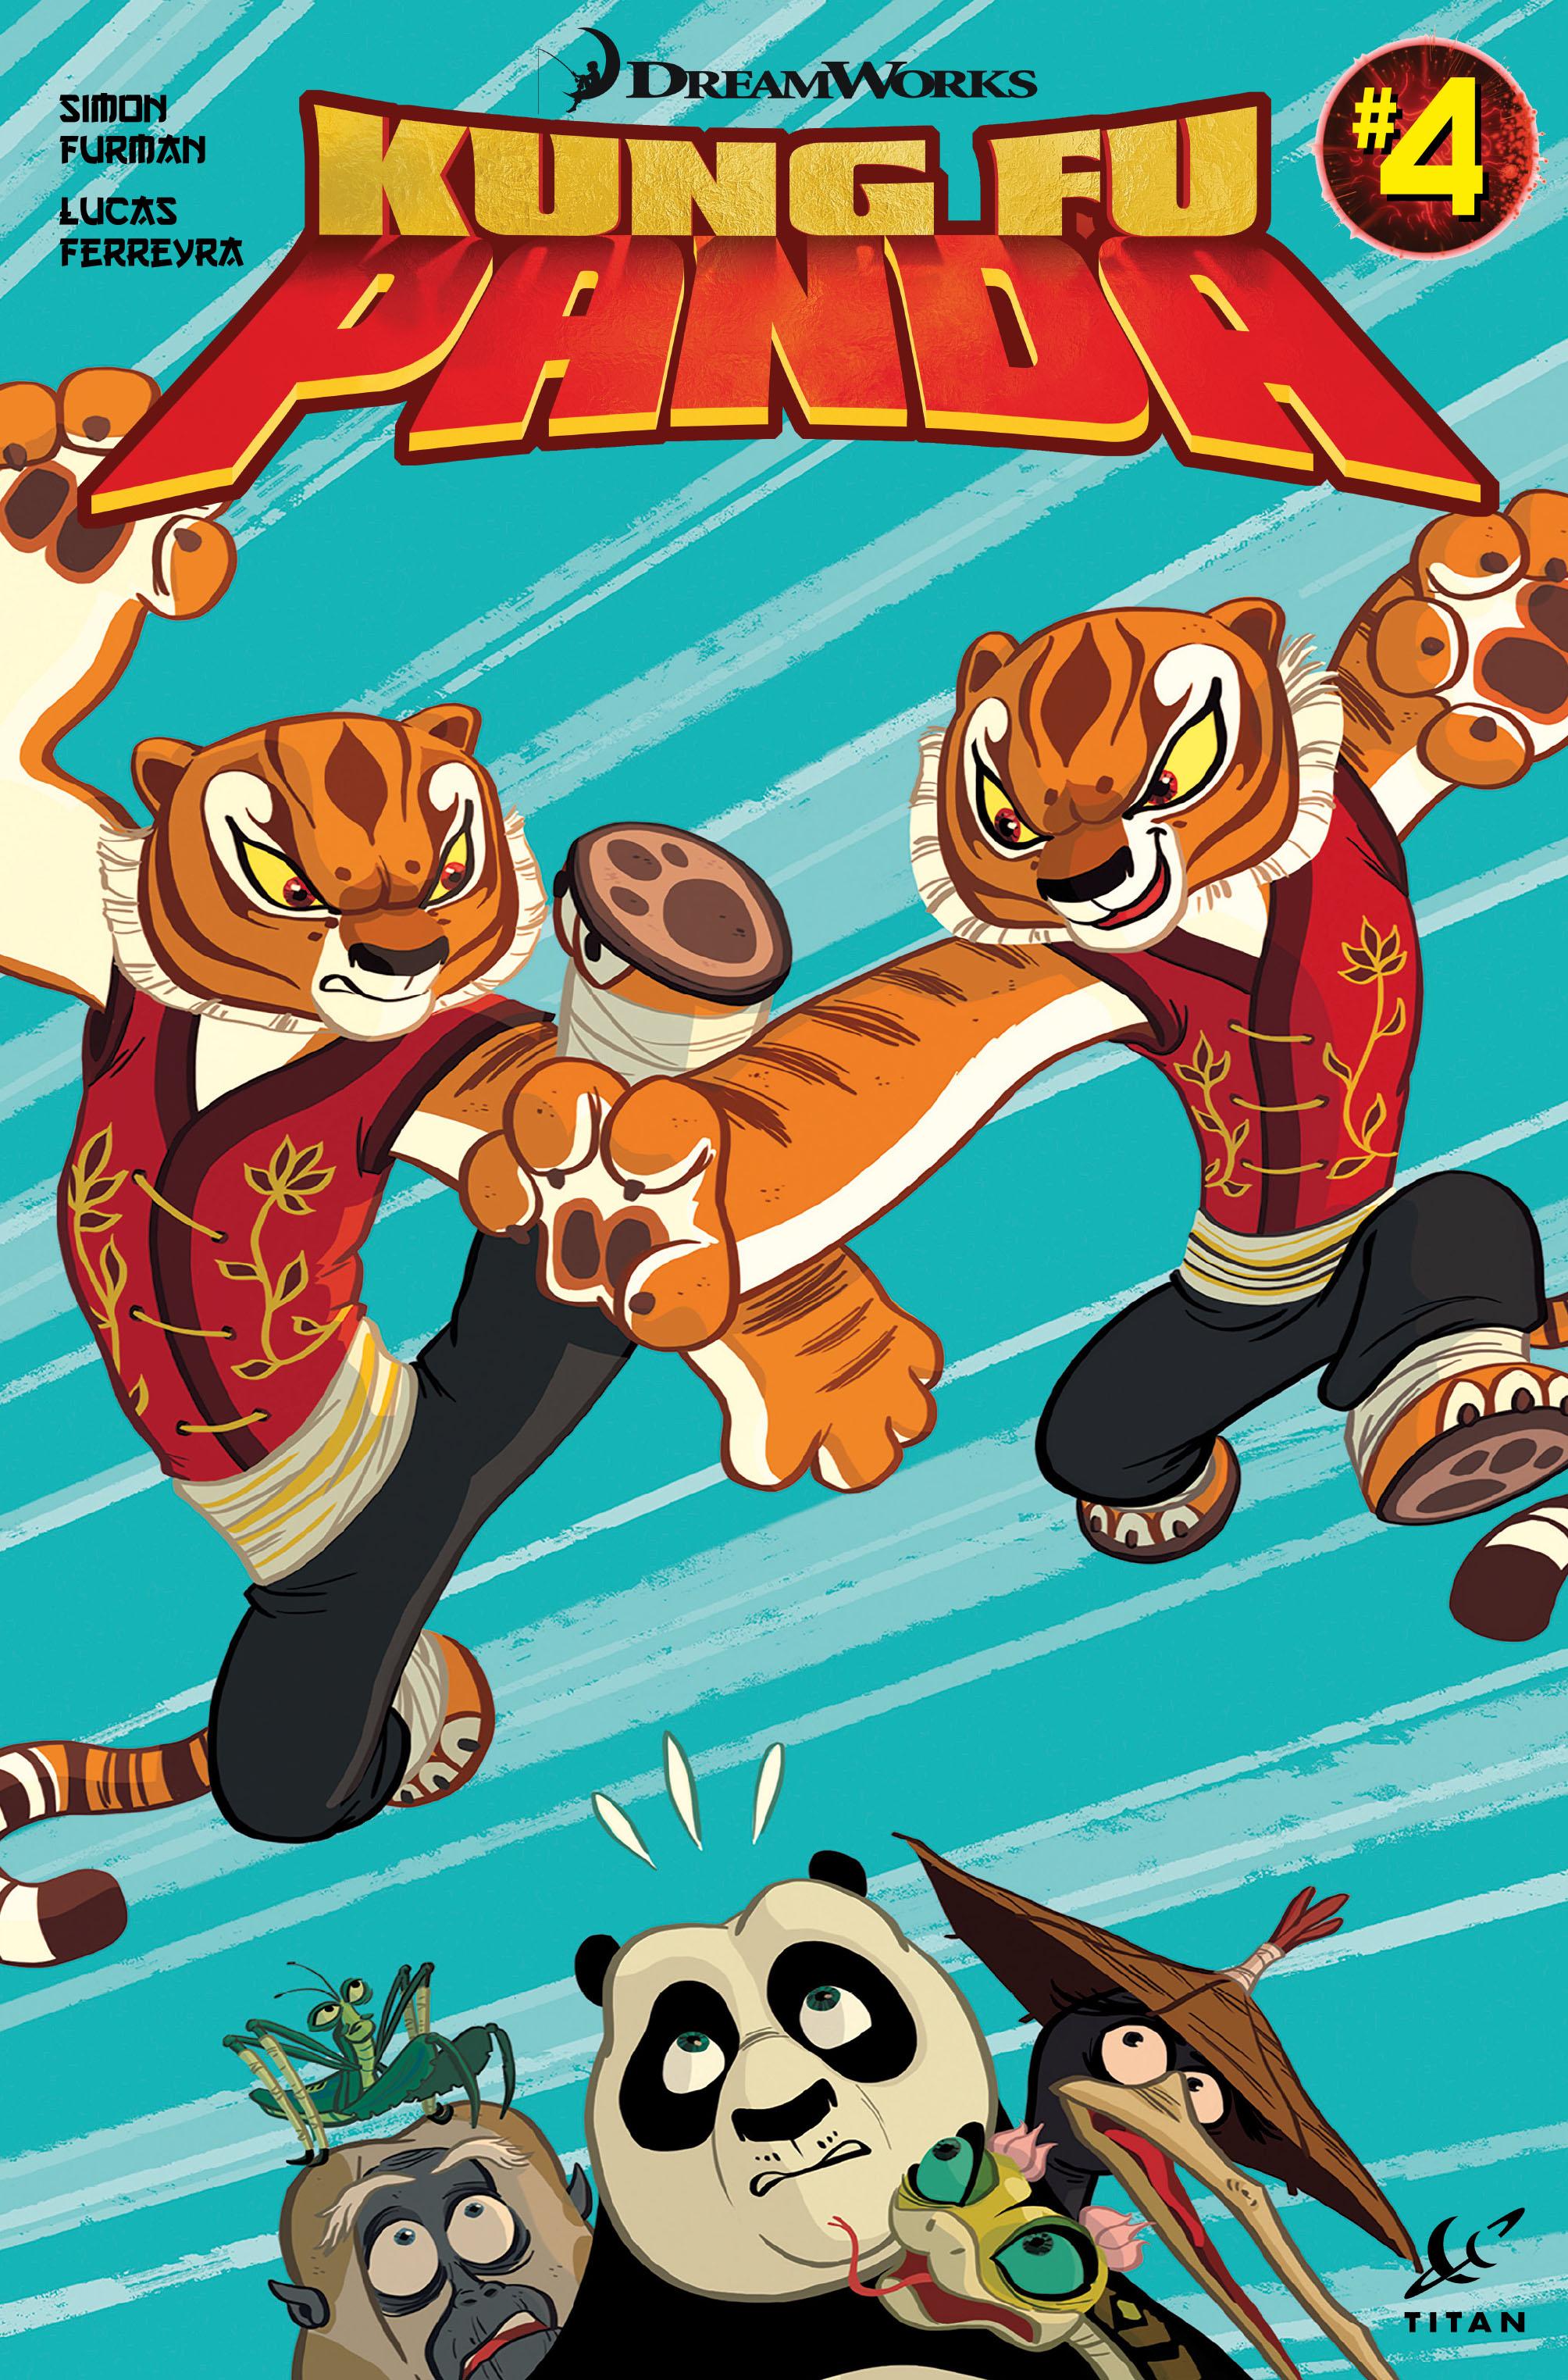 Kung Fu Panda #4 Cover